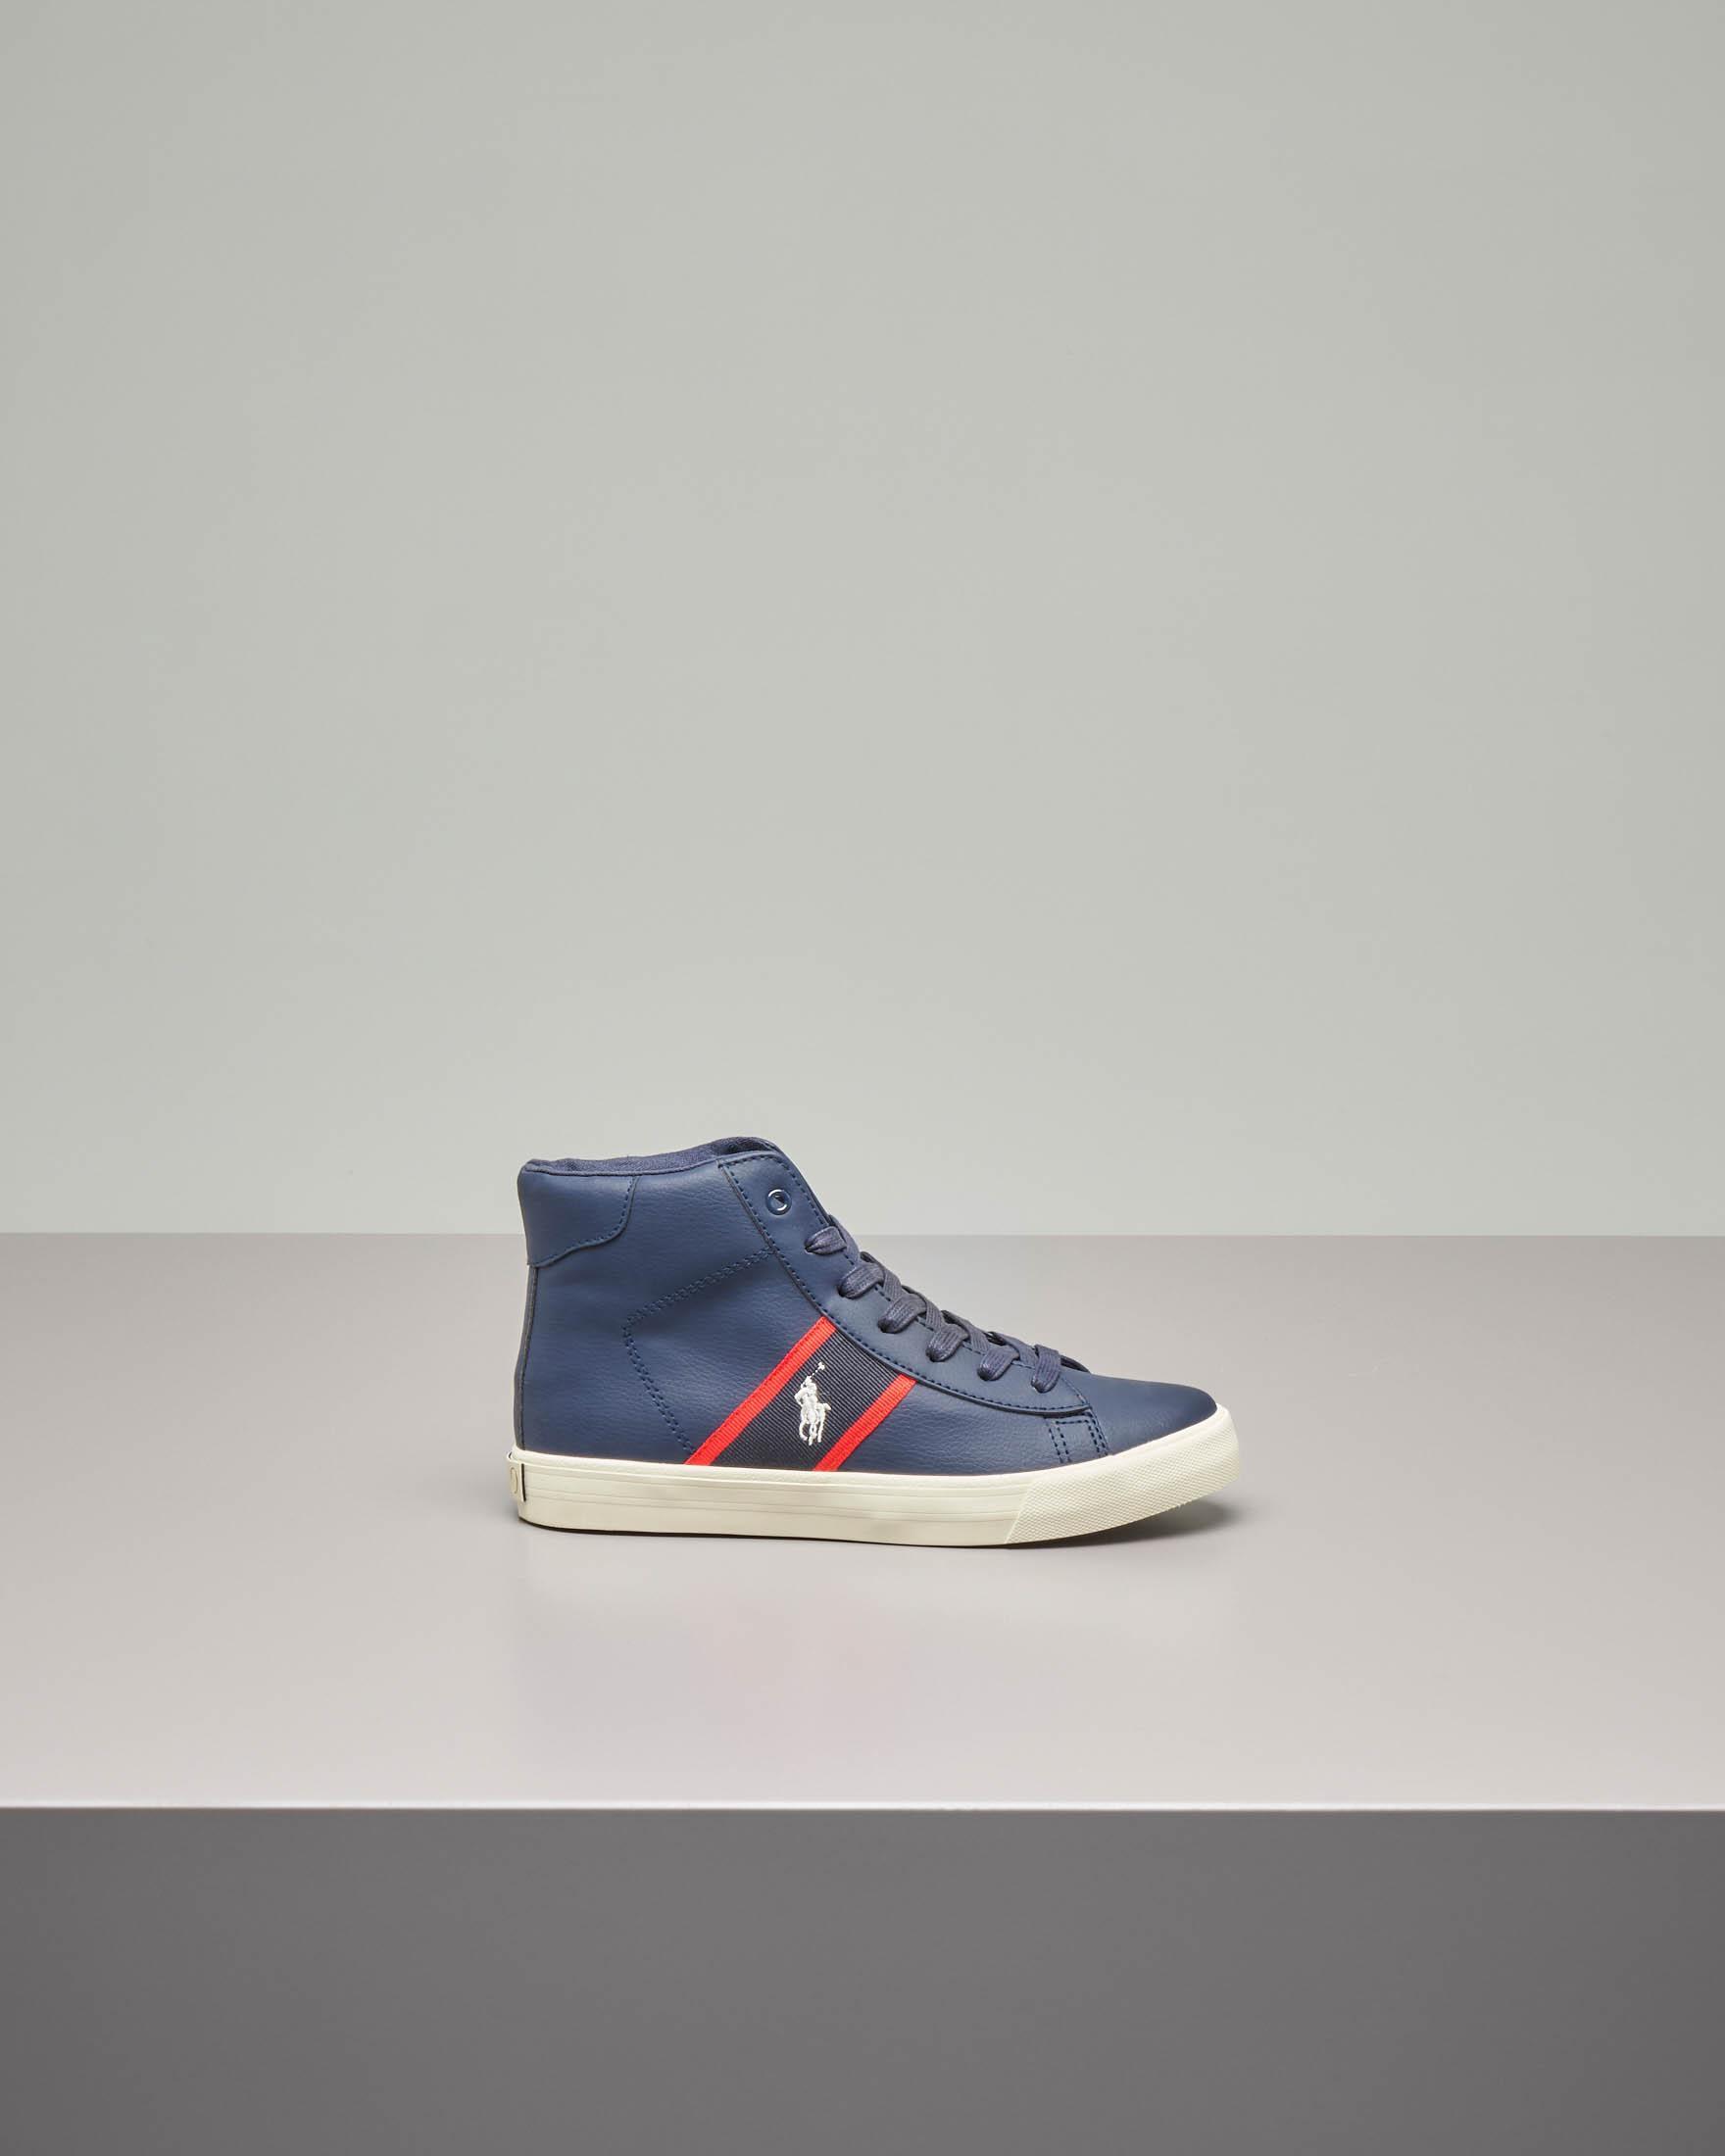 Sneakers alte blu in pelle con logo pony ricamato 35-39